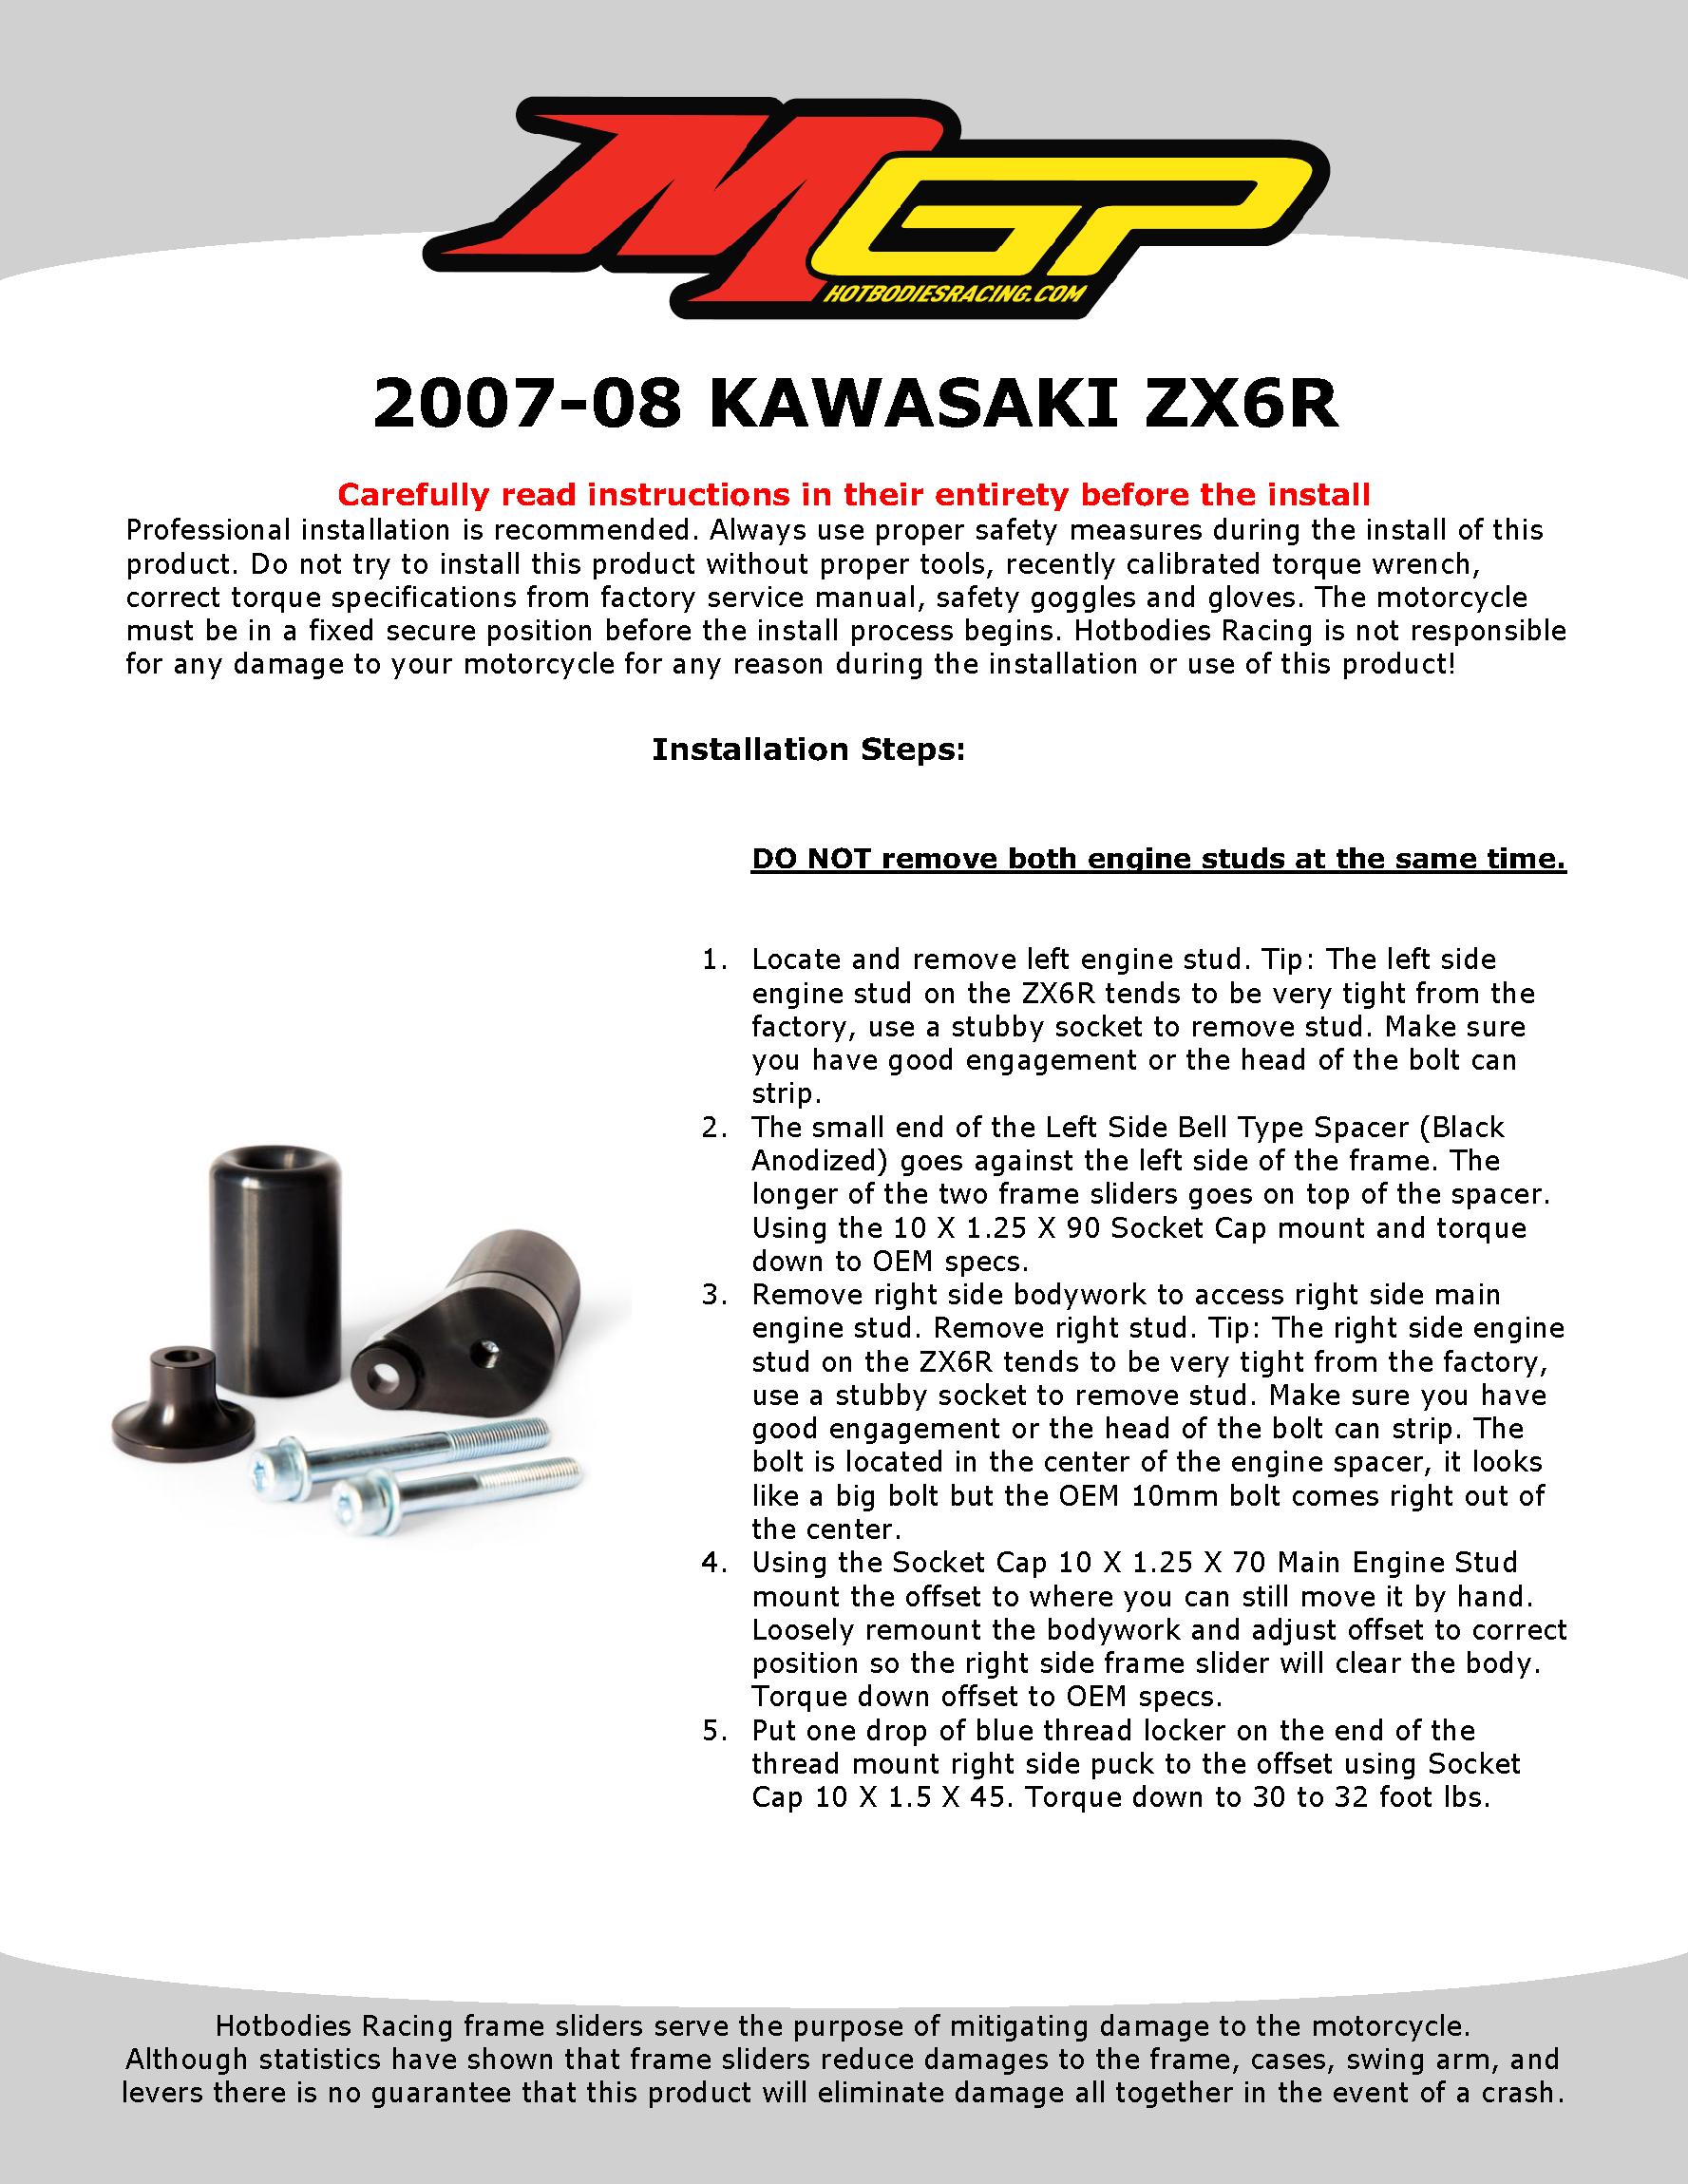 ZX6R 2007-08 Frame Sliders